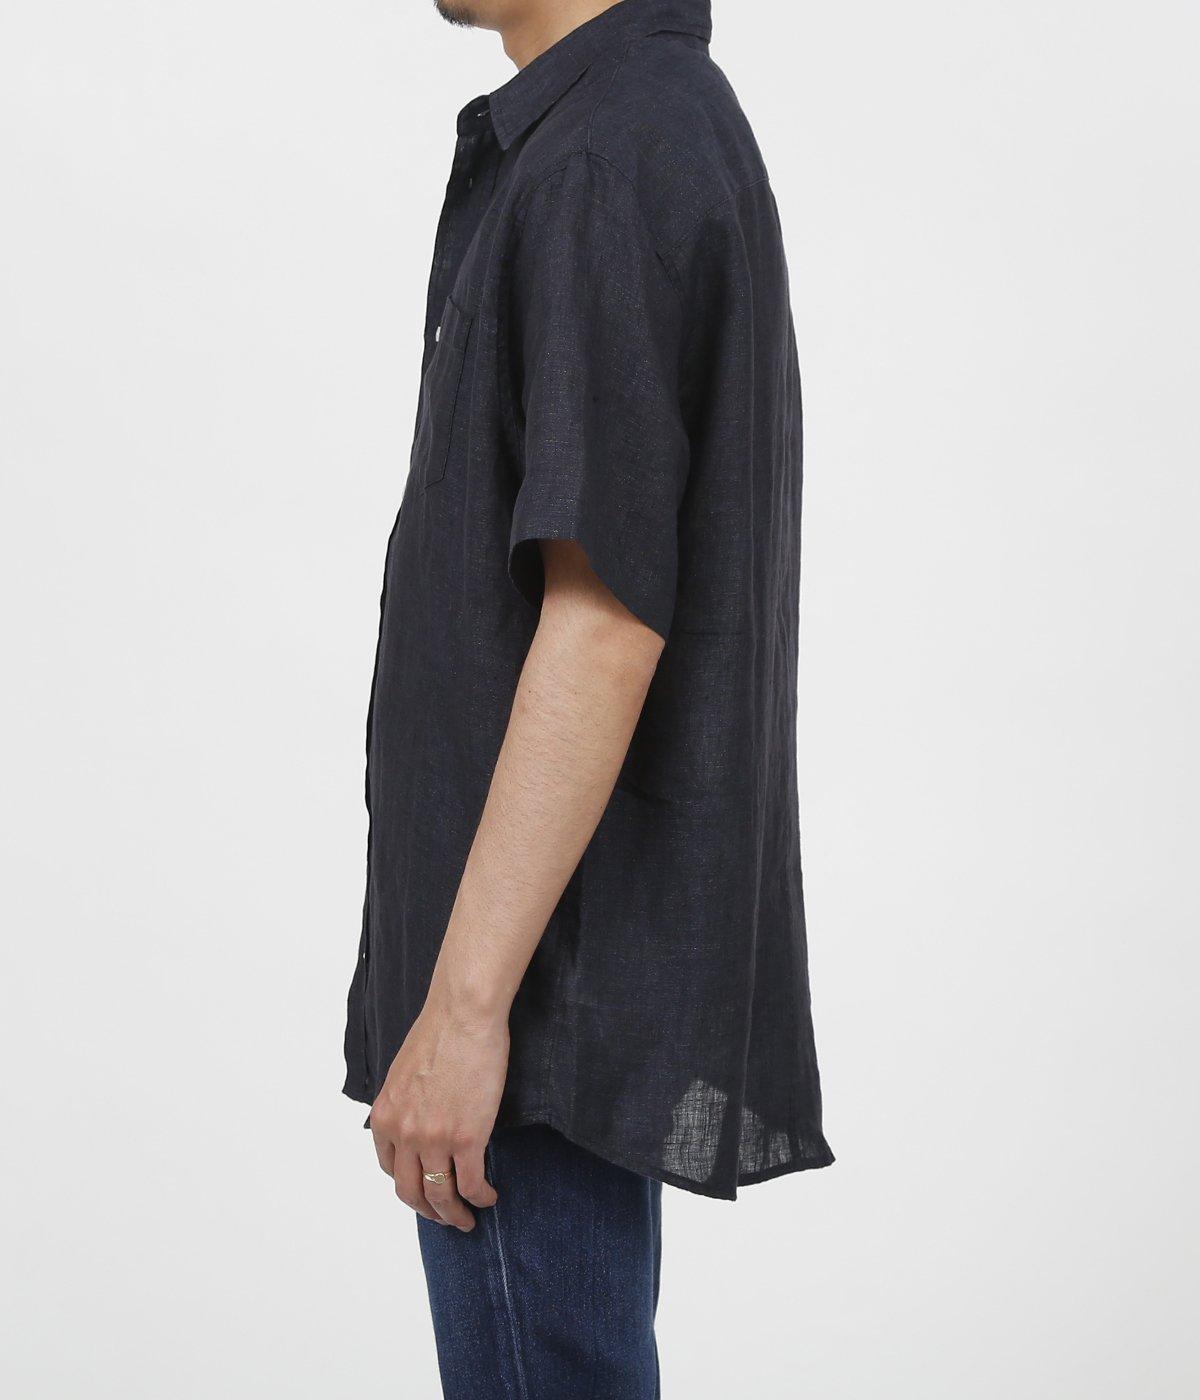 JP COLIN/LINEN